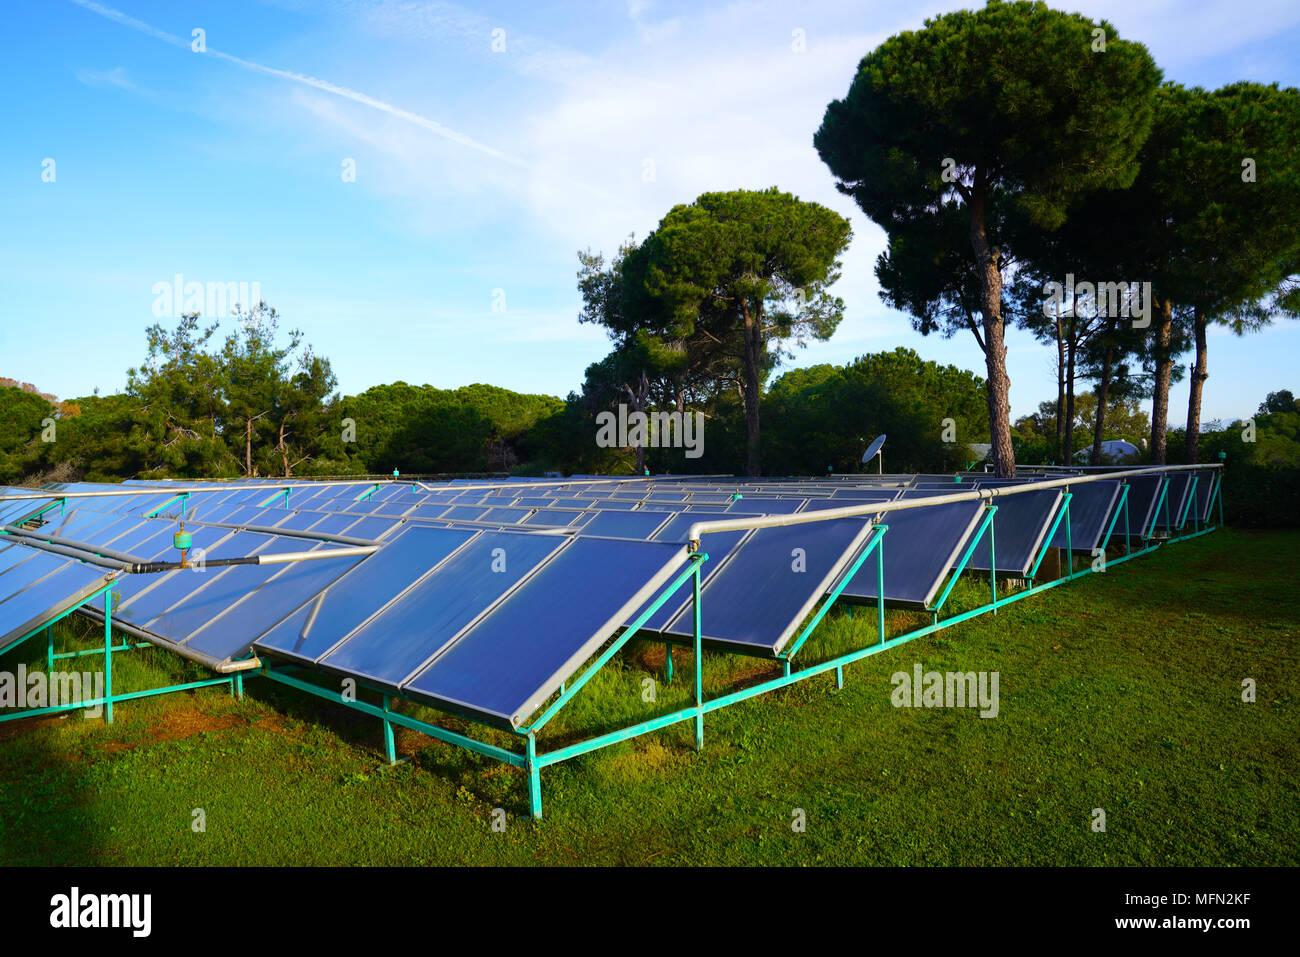 Photovoltaic power station or solar farm among trees in Antalya, Turkey - Stock Image